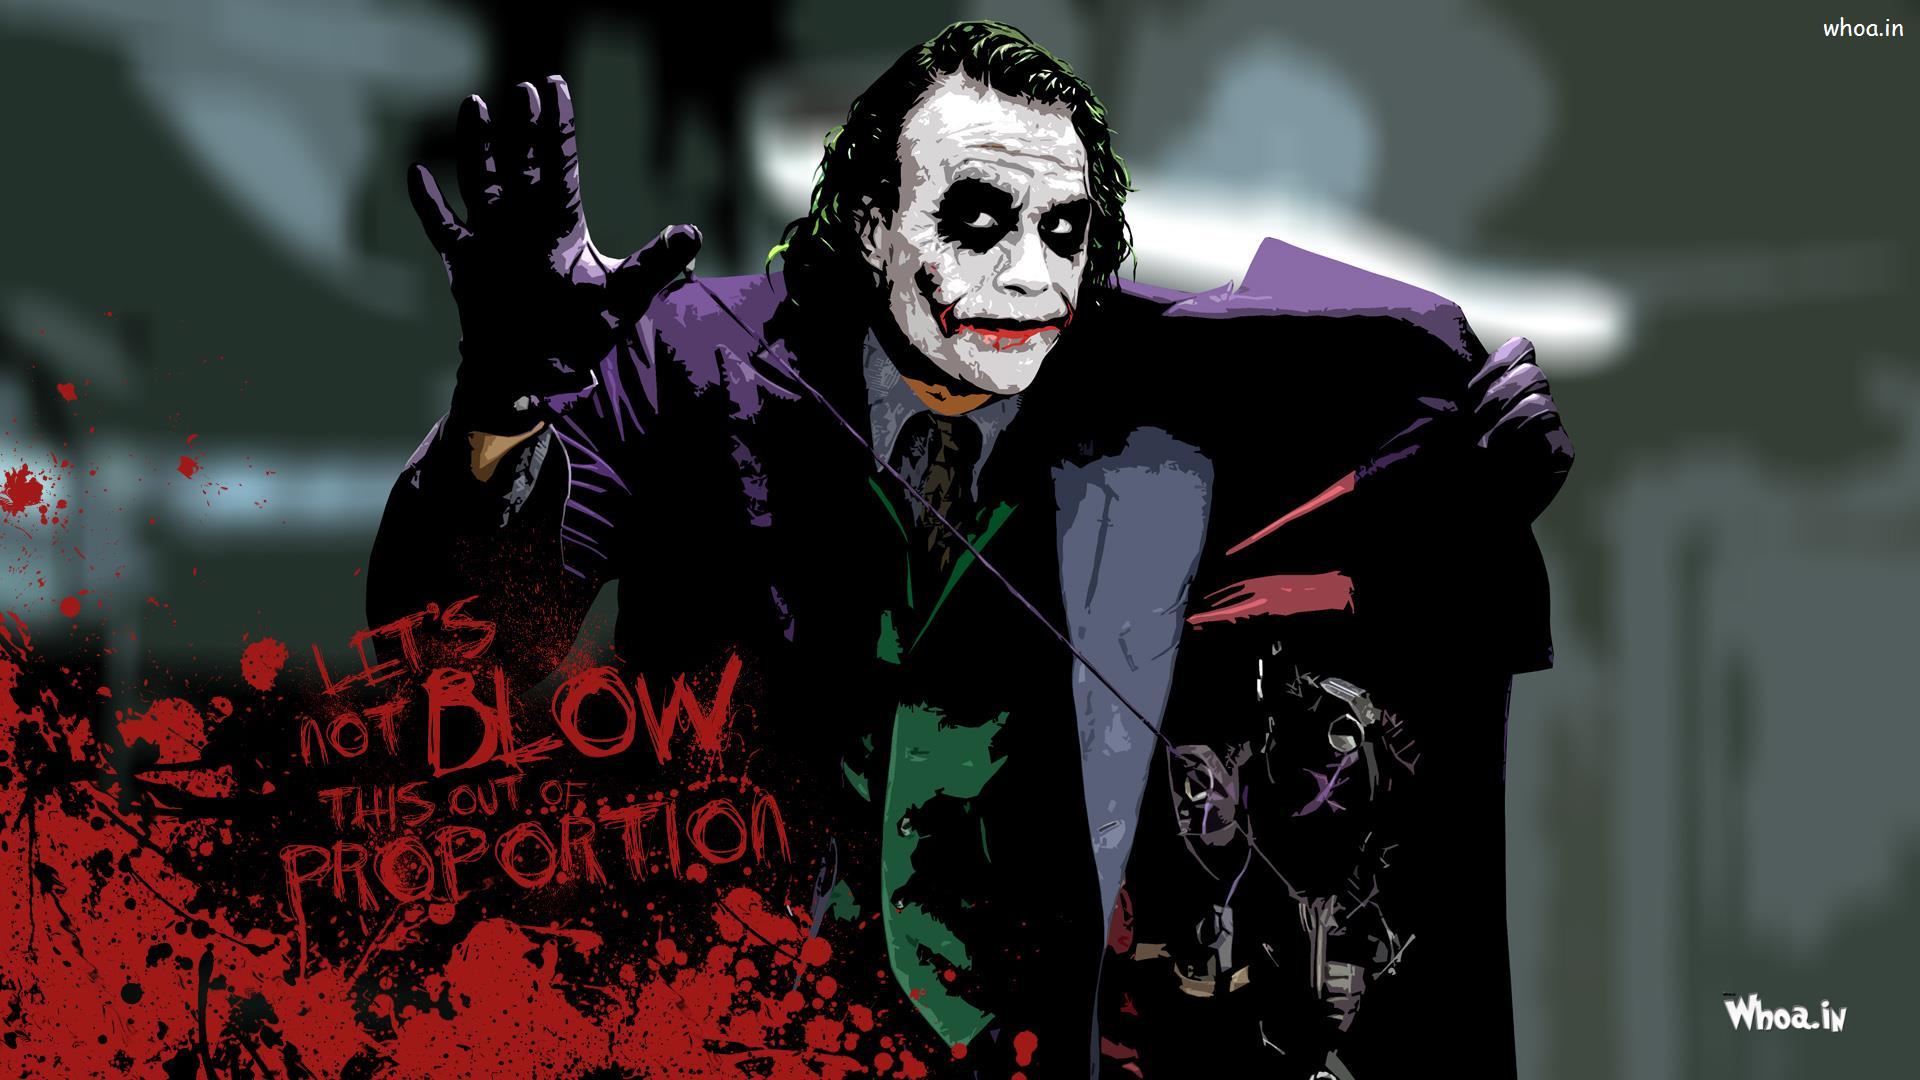 Hd wallpaper of joker -  The Joker Heath Ledger With Quotes Hd Wallpaper